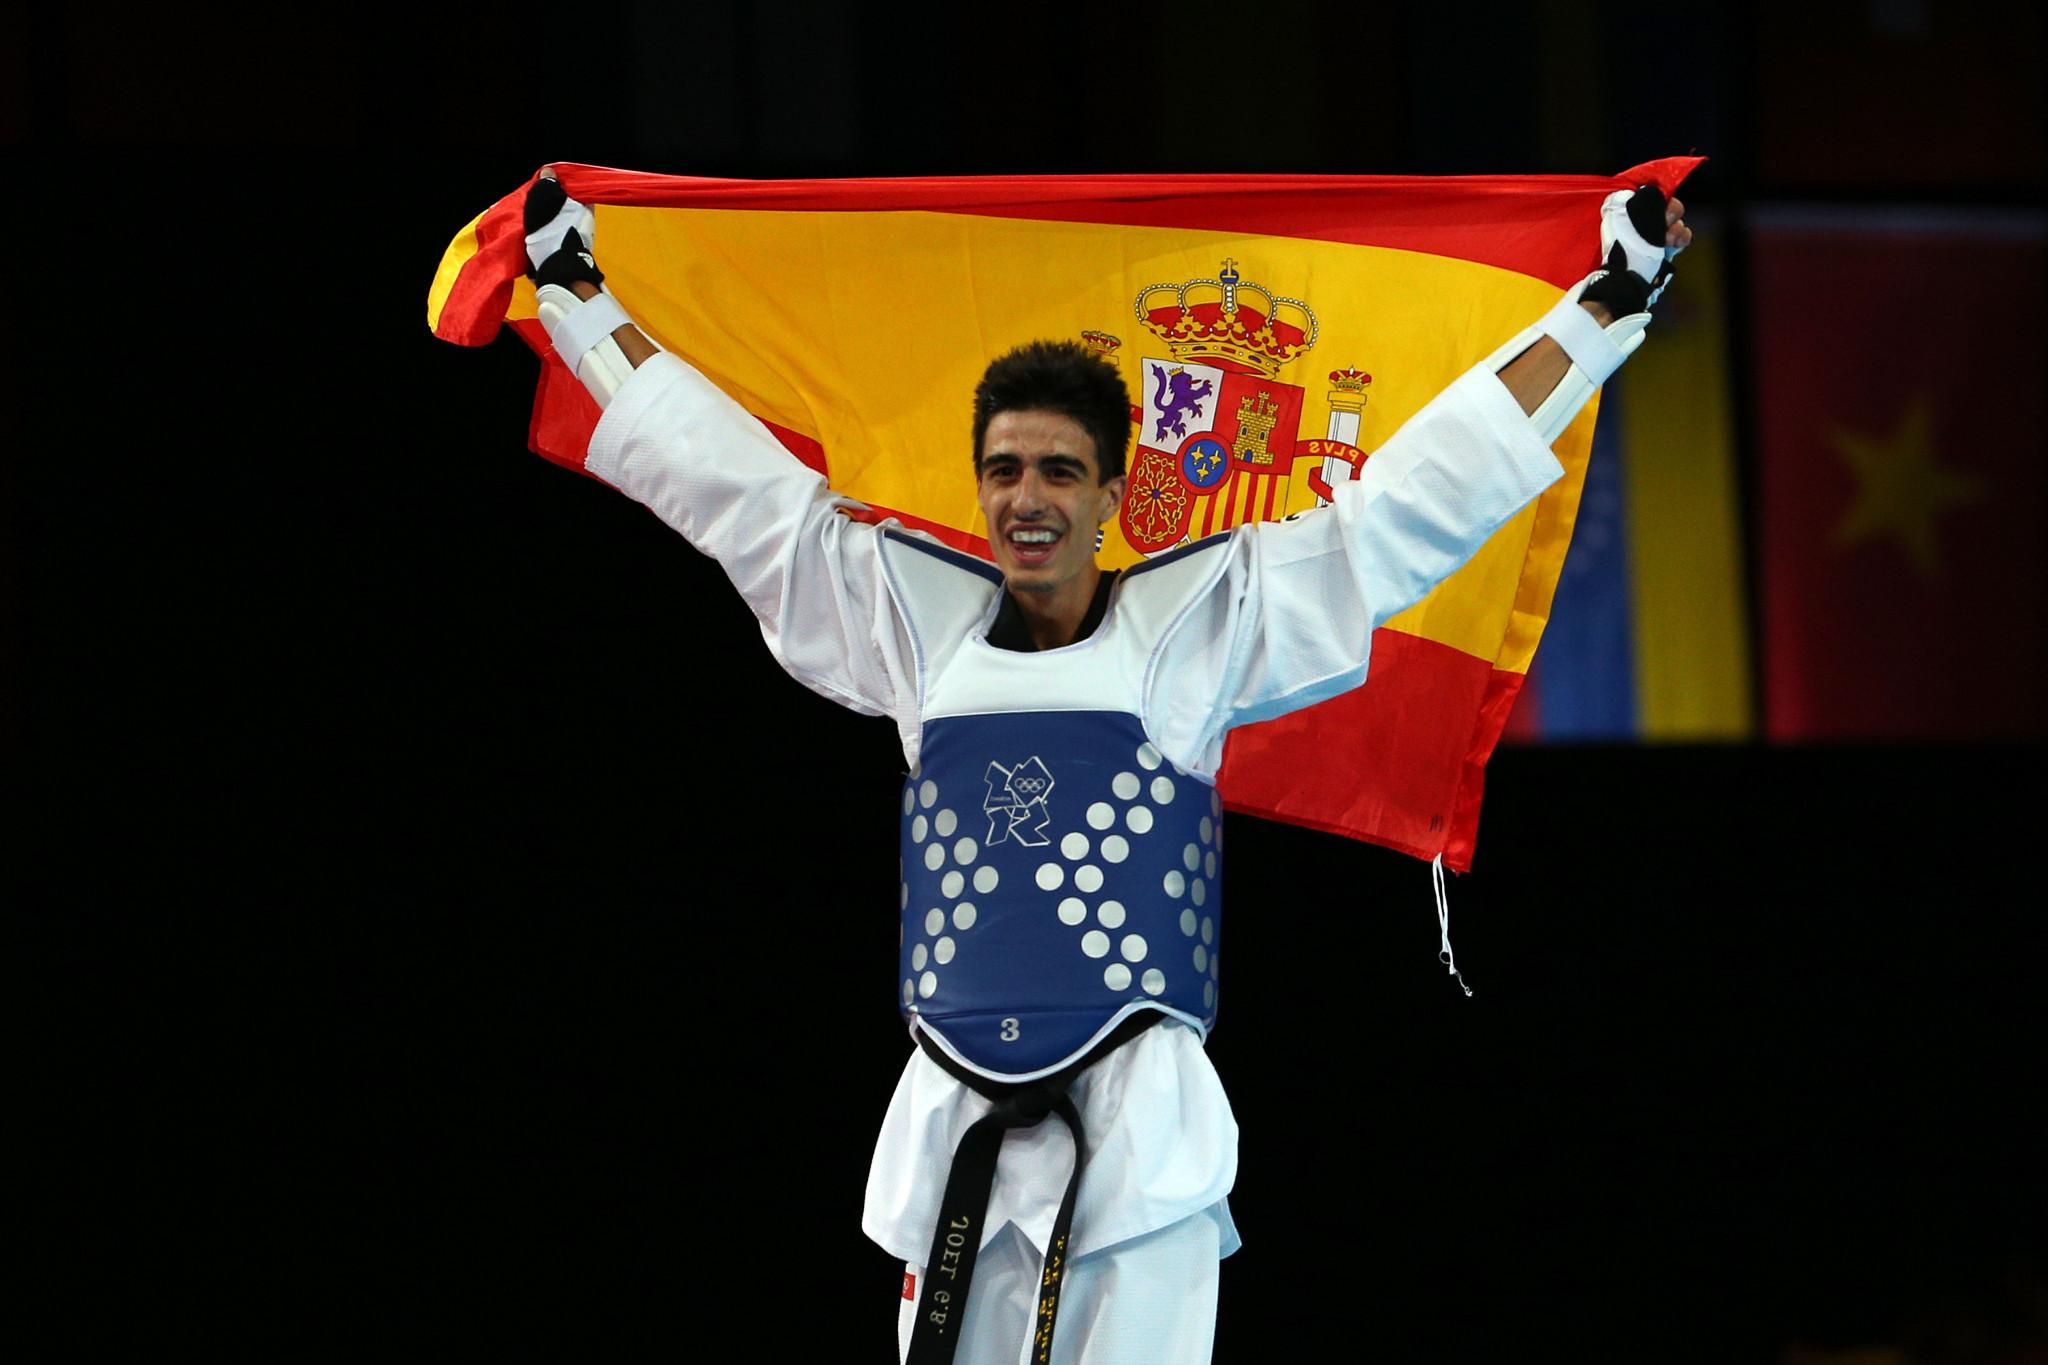 Joel González won taekwondo gold for Spain at London 2012 ©Getty Images